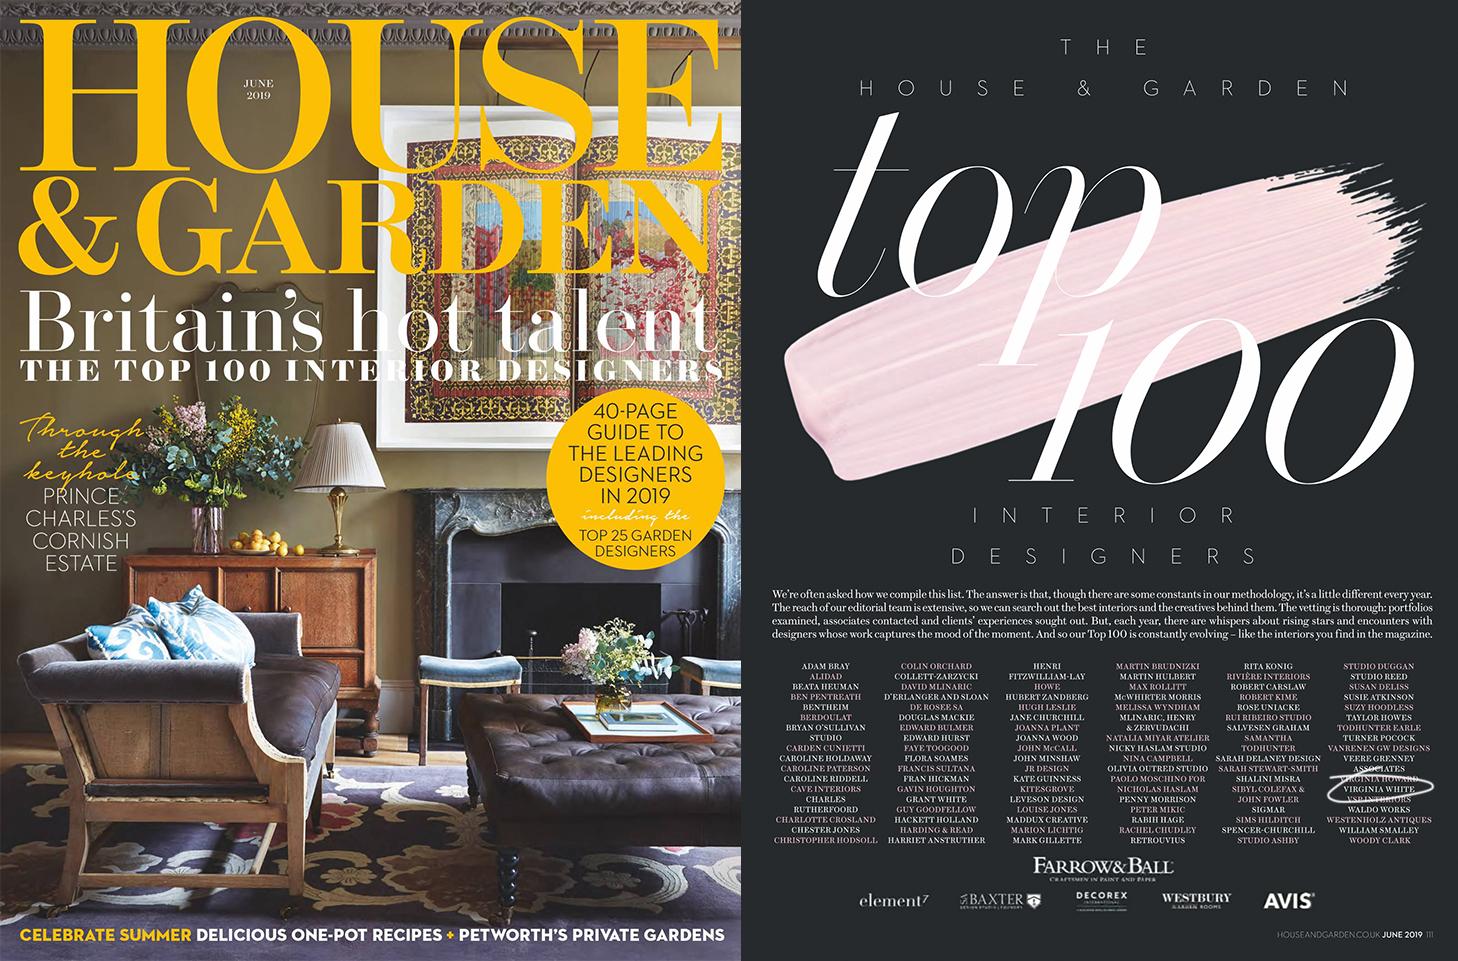 House & Garden (UK), June 2019. The House & Garden Top 100 Interior Designers